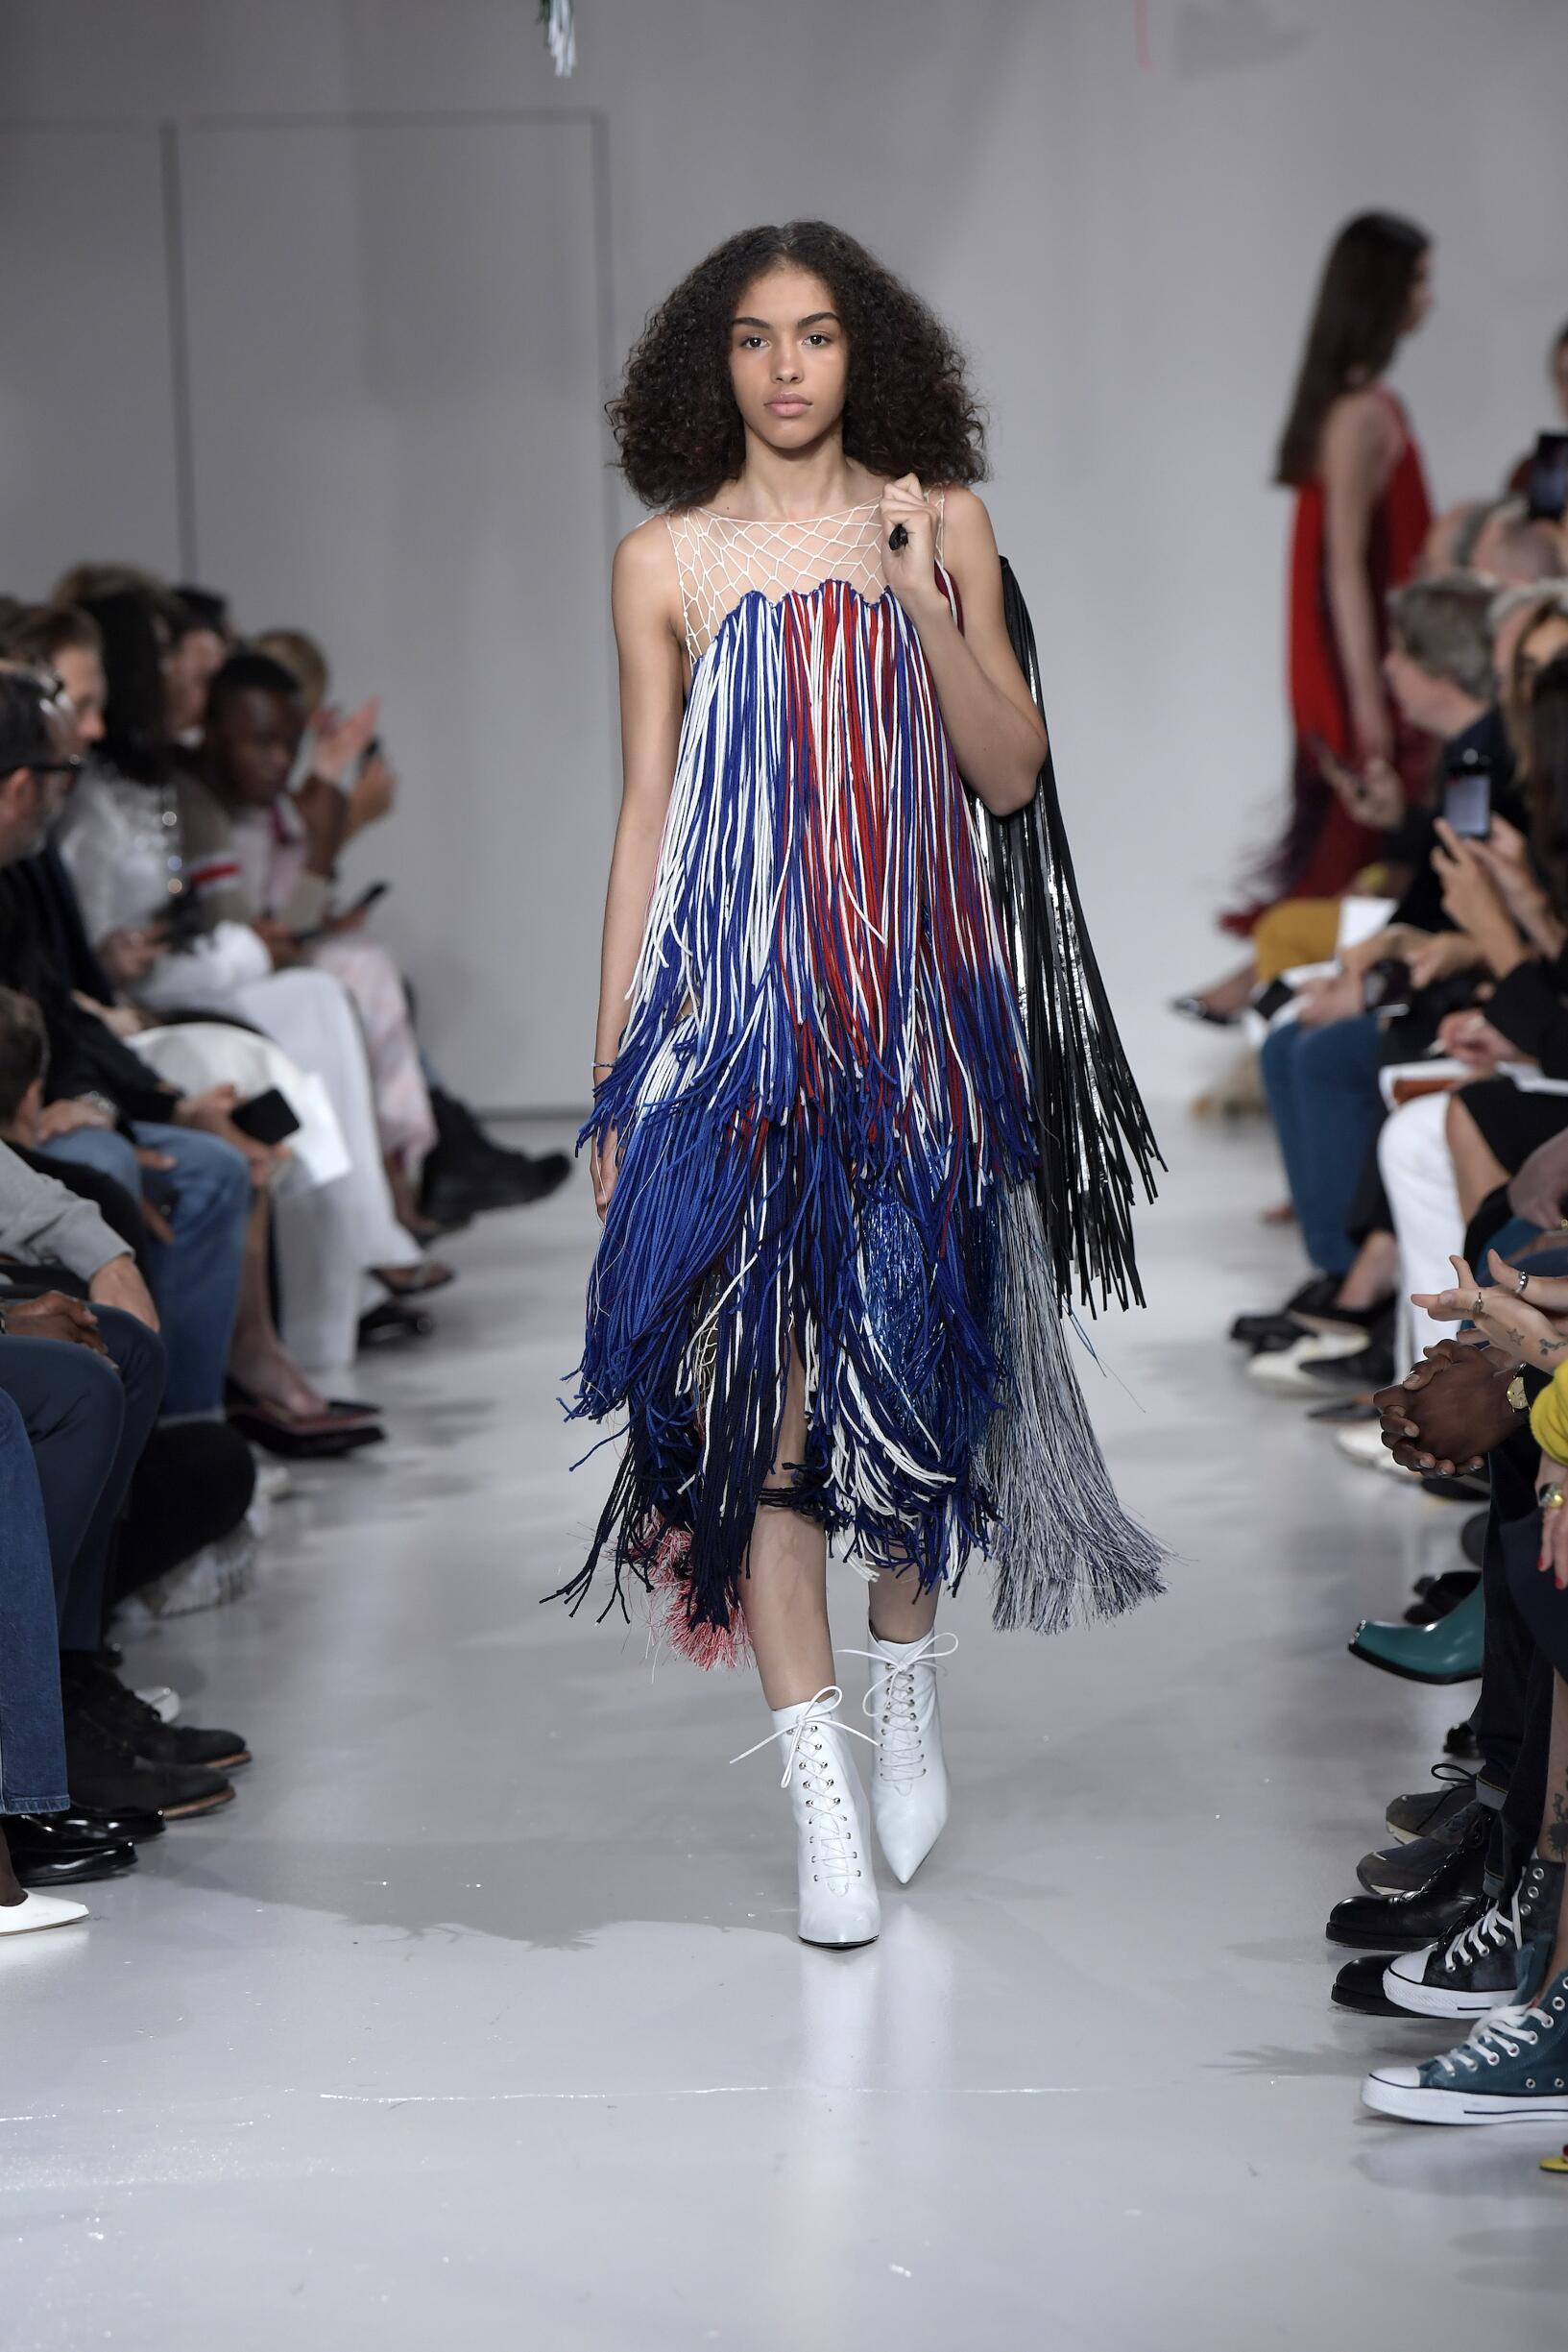 Fashion 2018 Runway Calvin Klein 205W39NYC Summer Woman